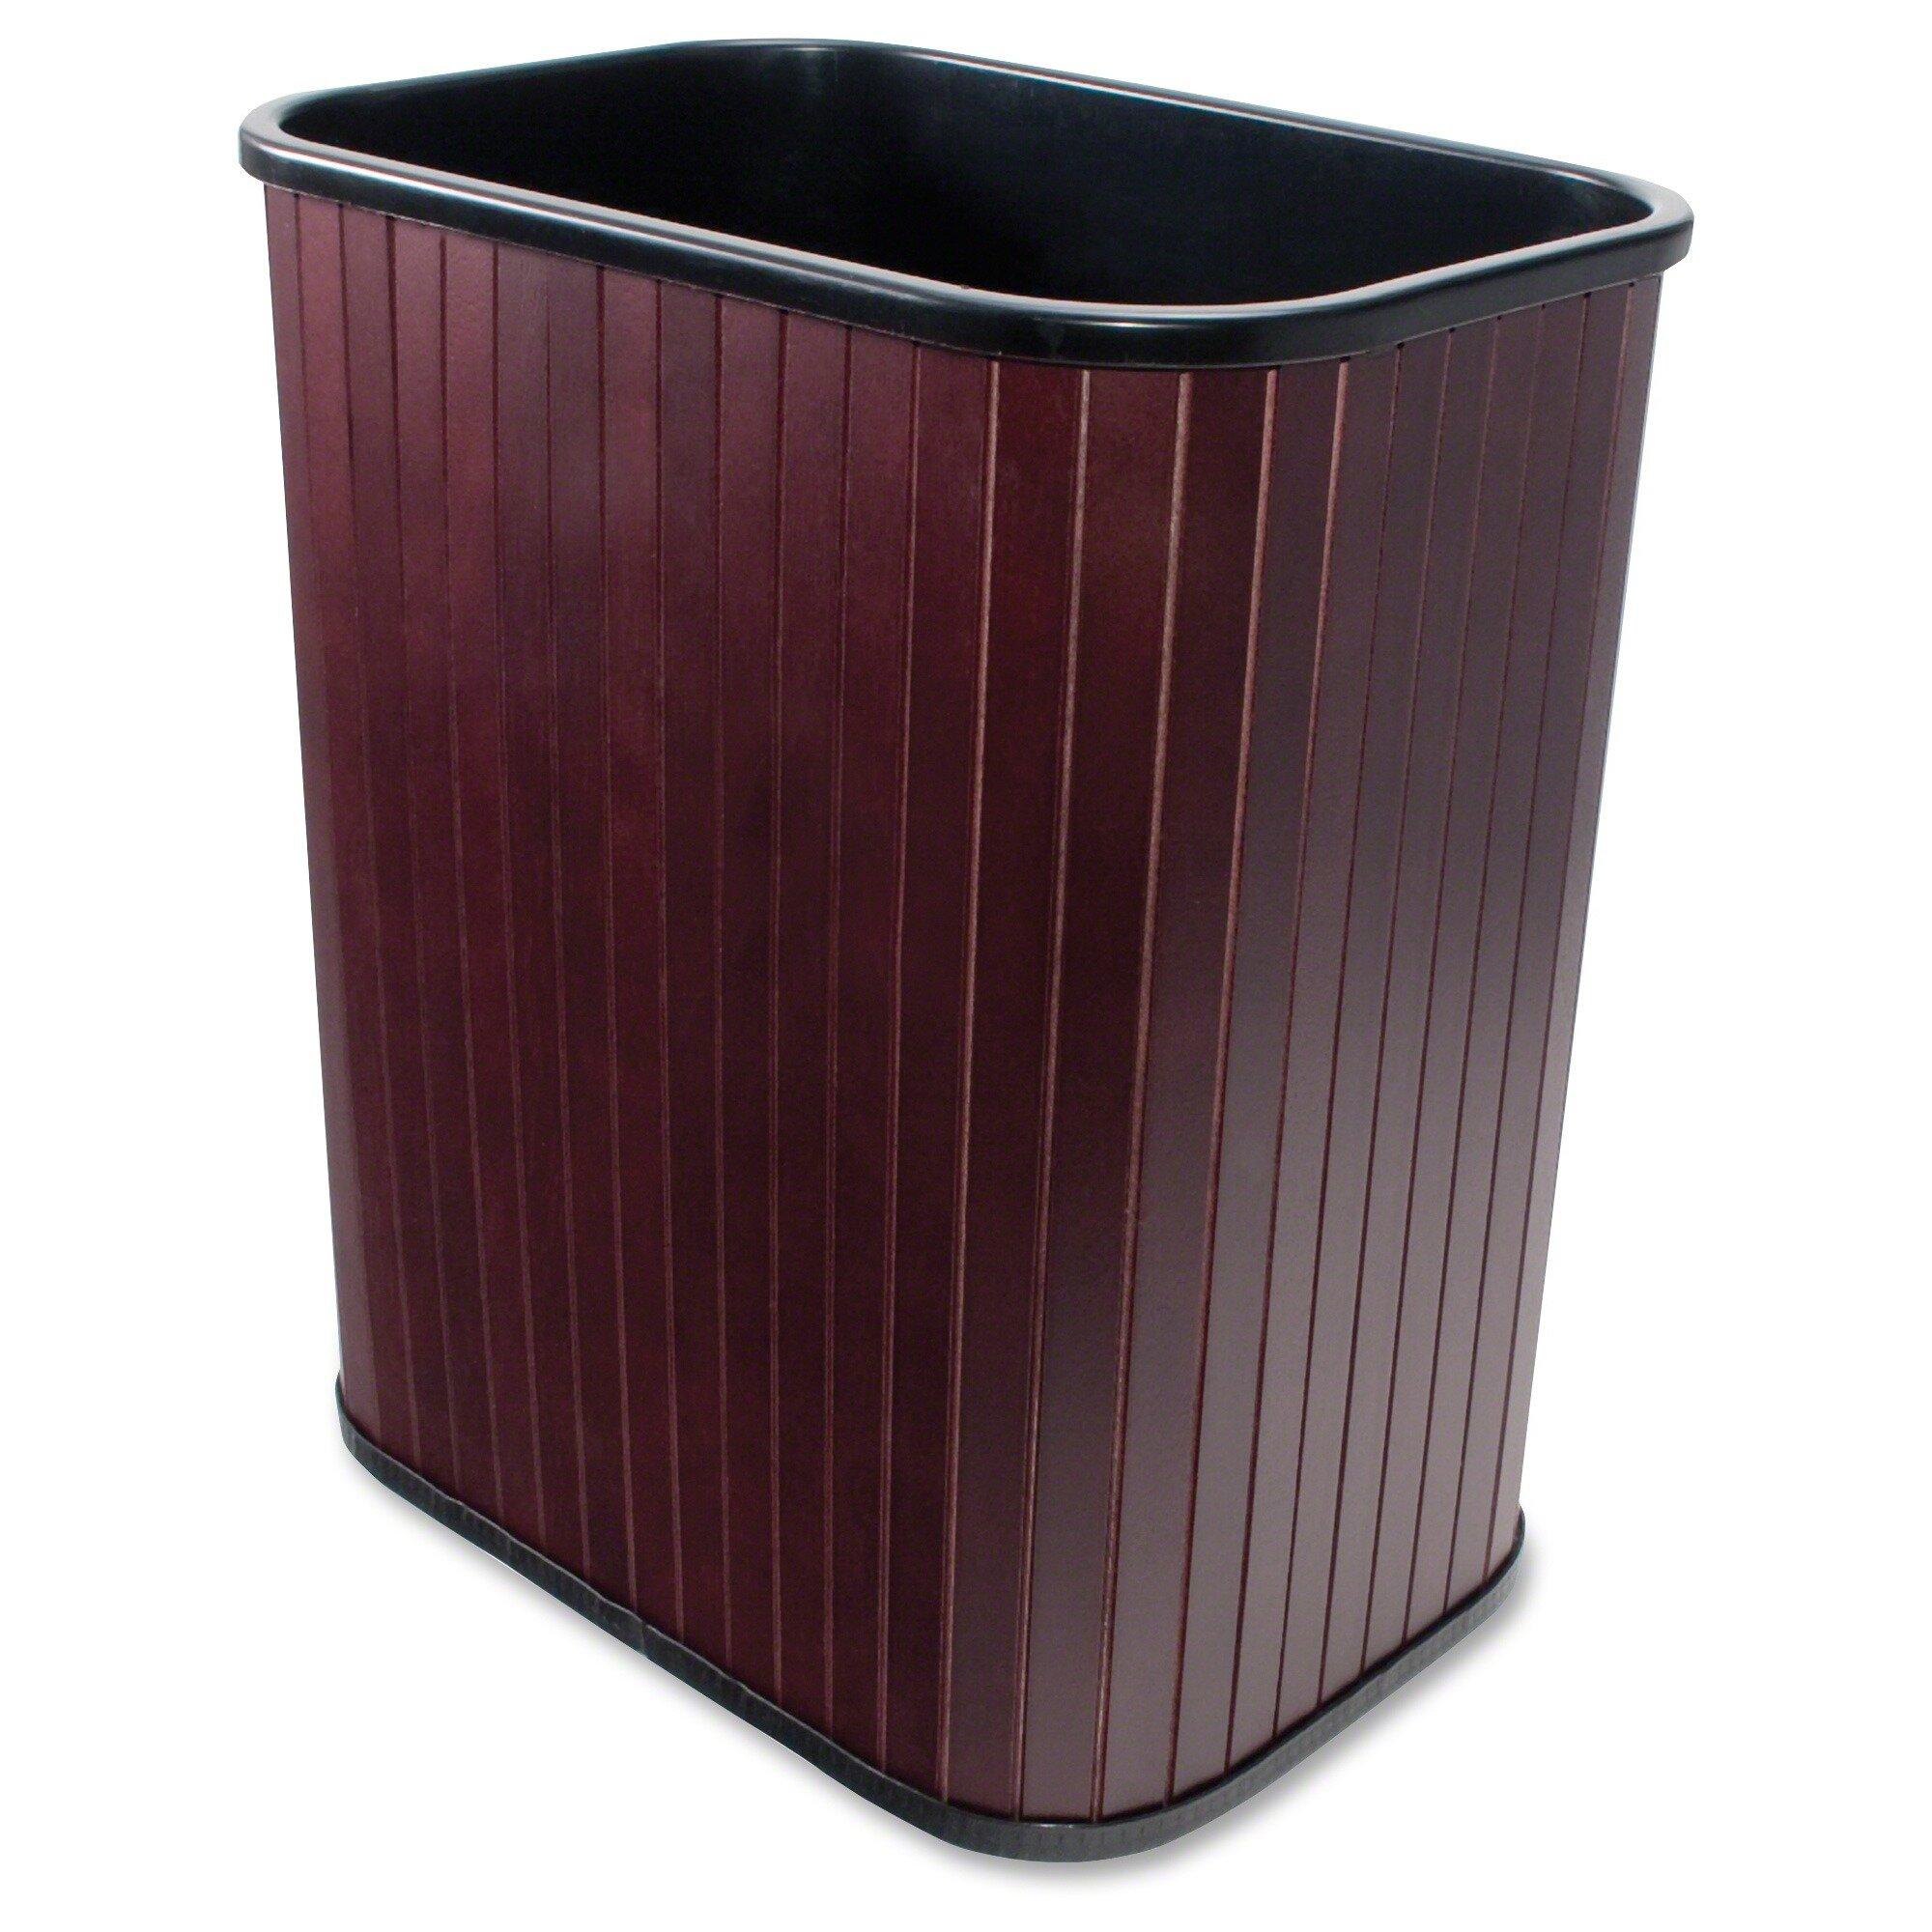 Carver rectangular trash can reviews wayfair - Rectangular garbage cans ...